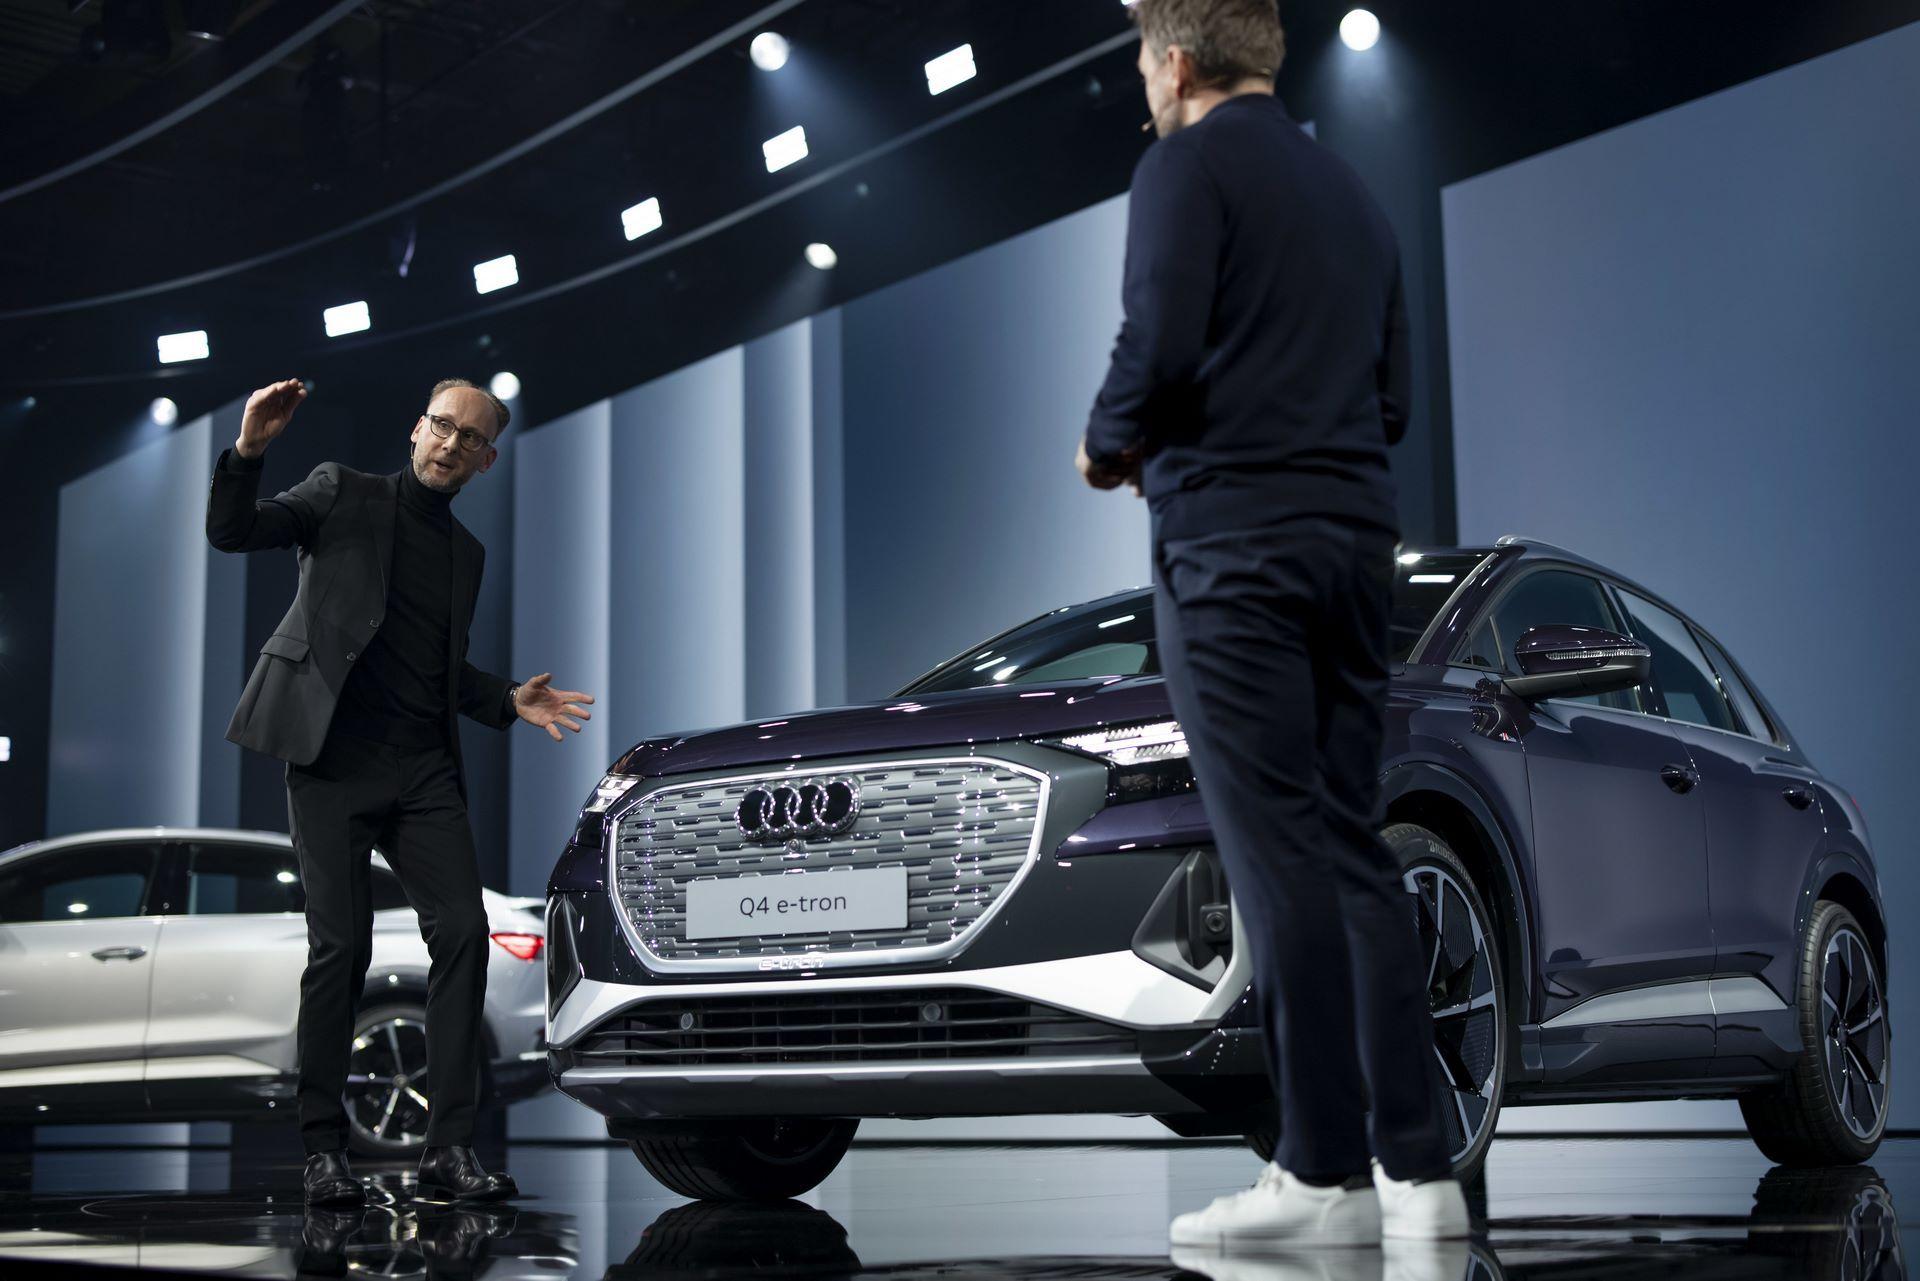 Audi-Q4-e-tron-and-Q4-e-tron-Sportback-10